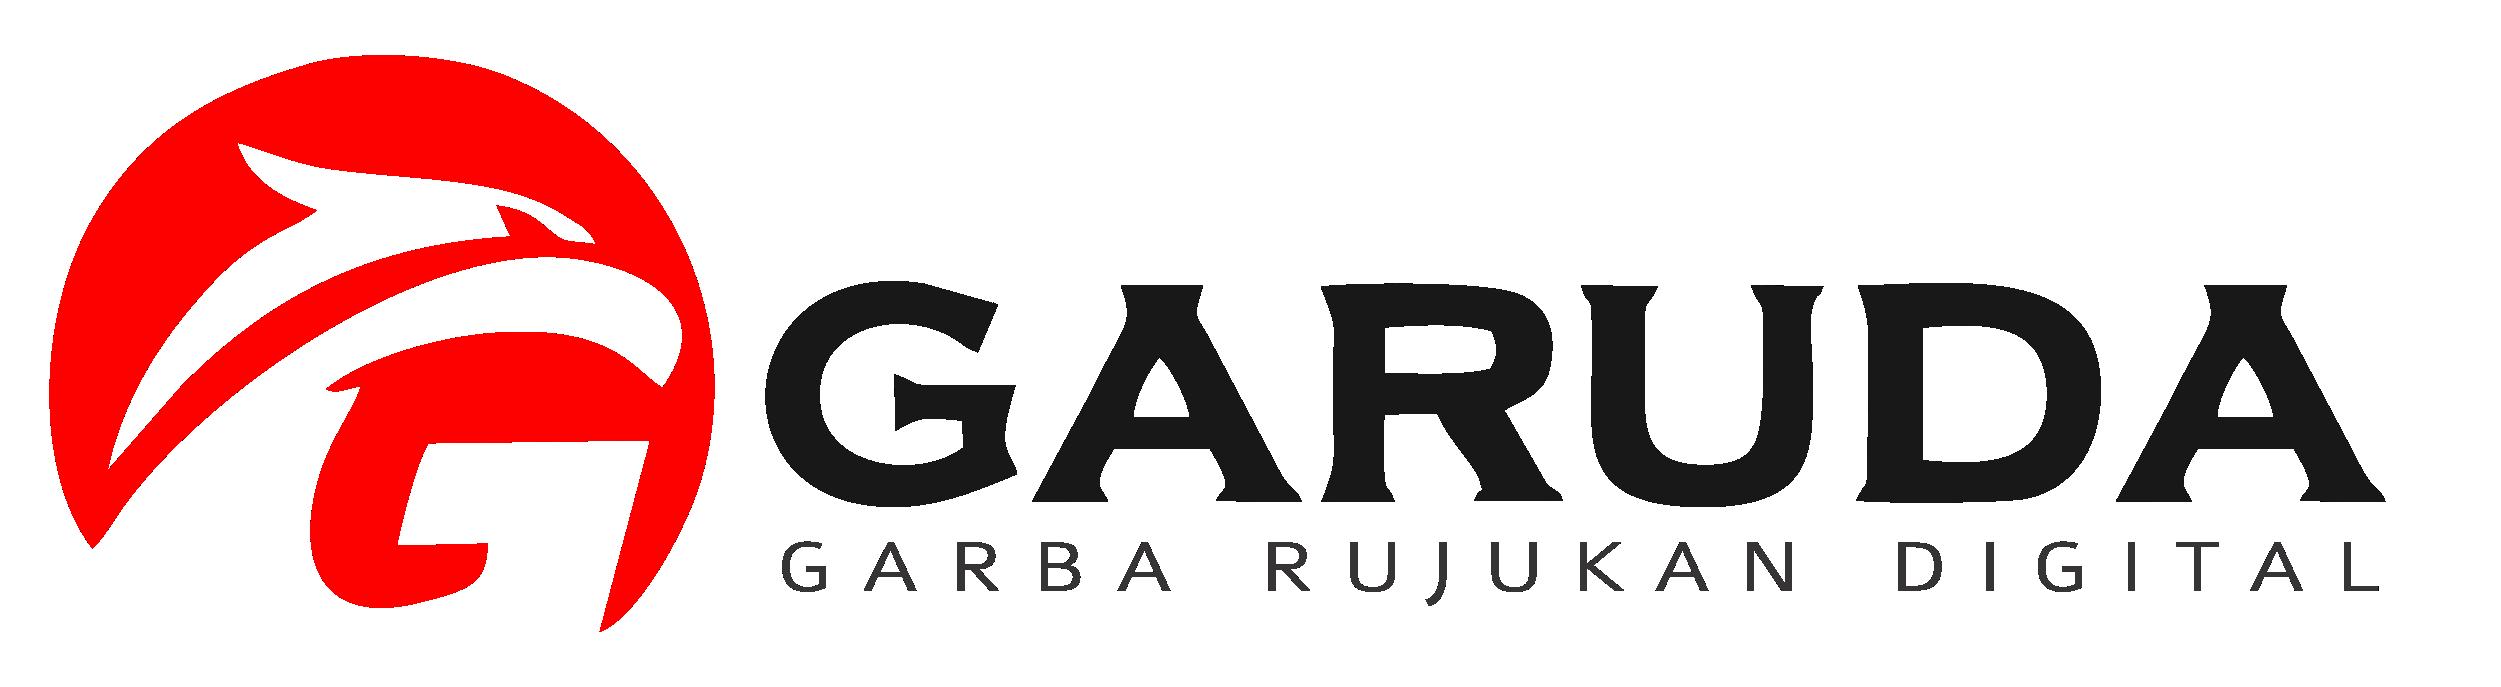 Image result for garuda jurnal logo